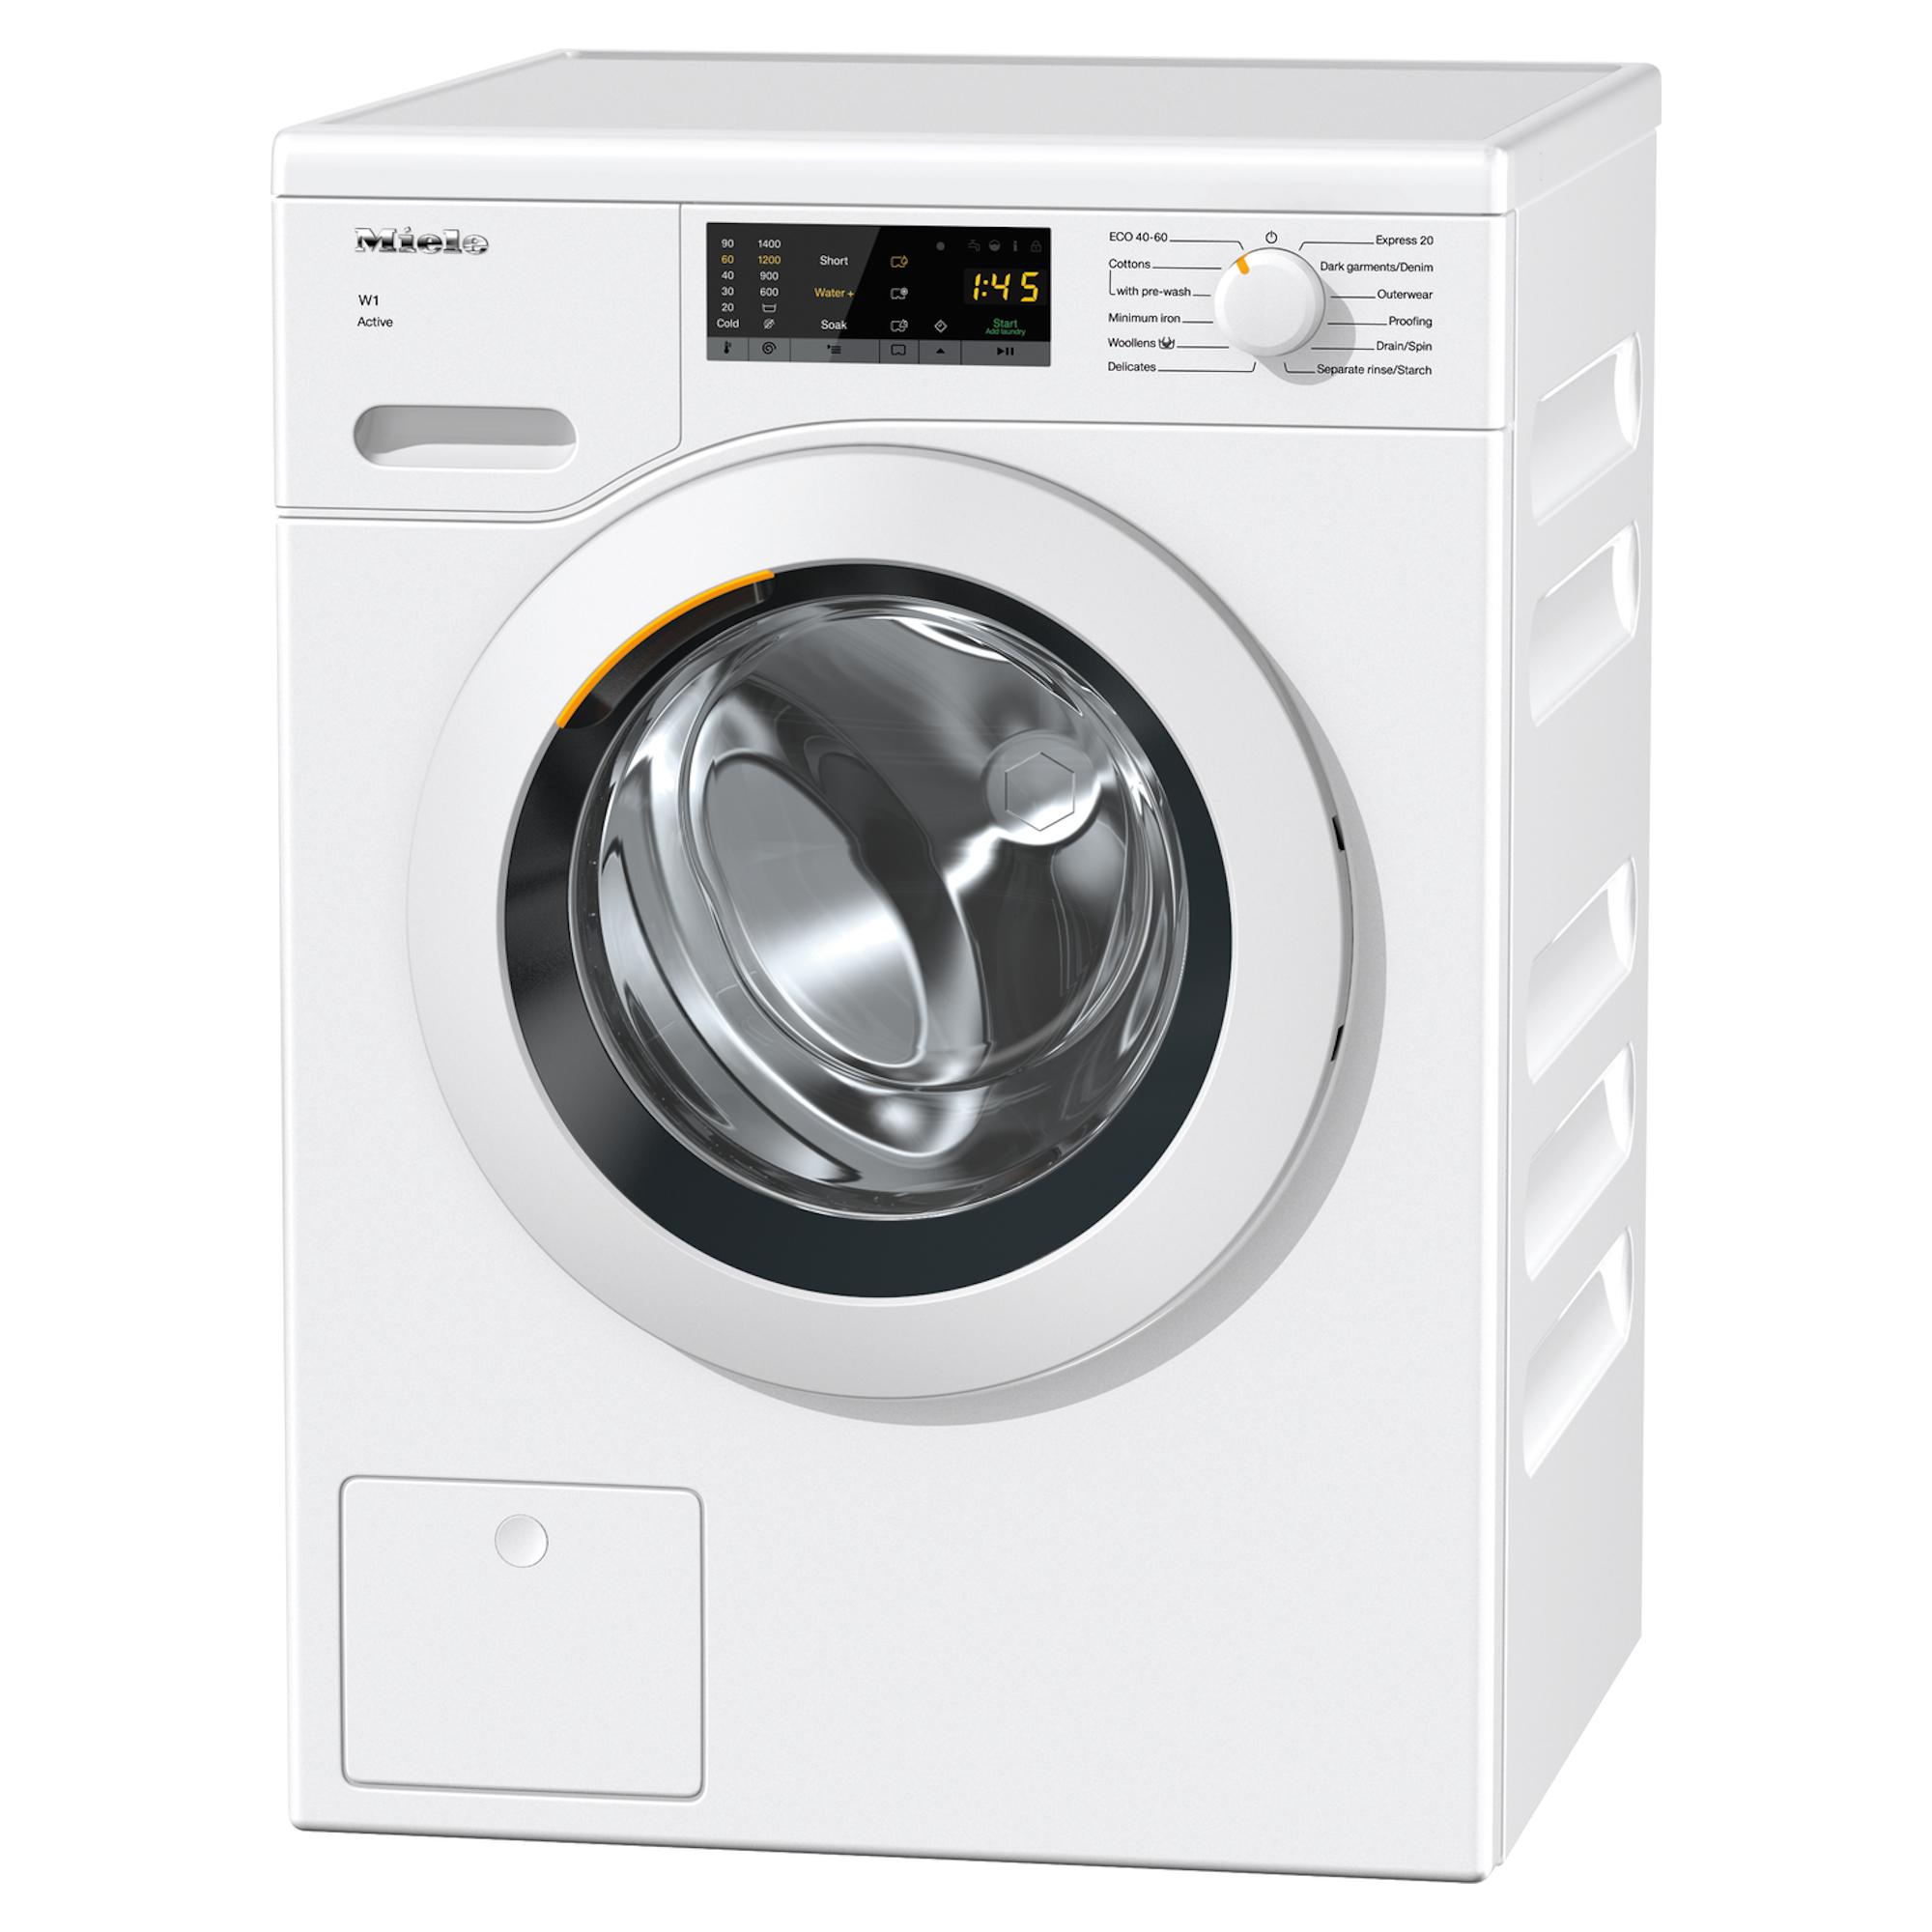 Miele WCA020 7kg 1400rpm Washing Machine